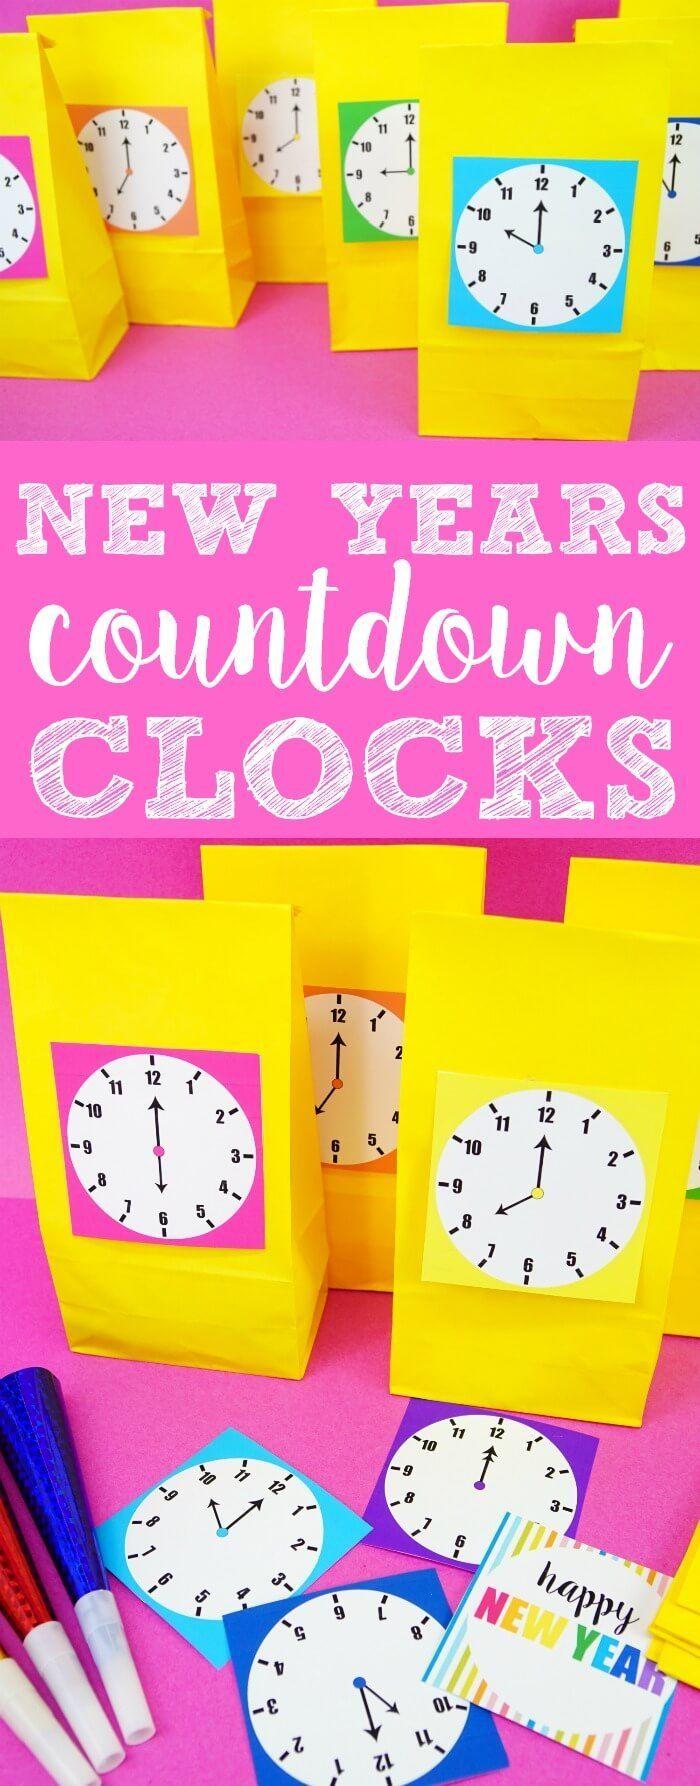 New Years Countdown Clock Online